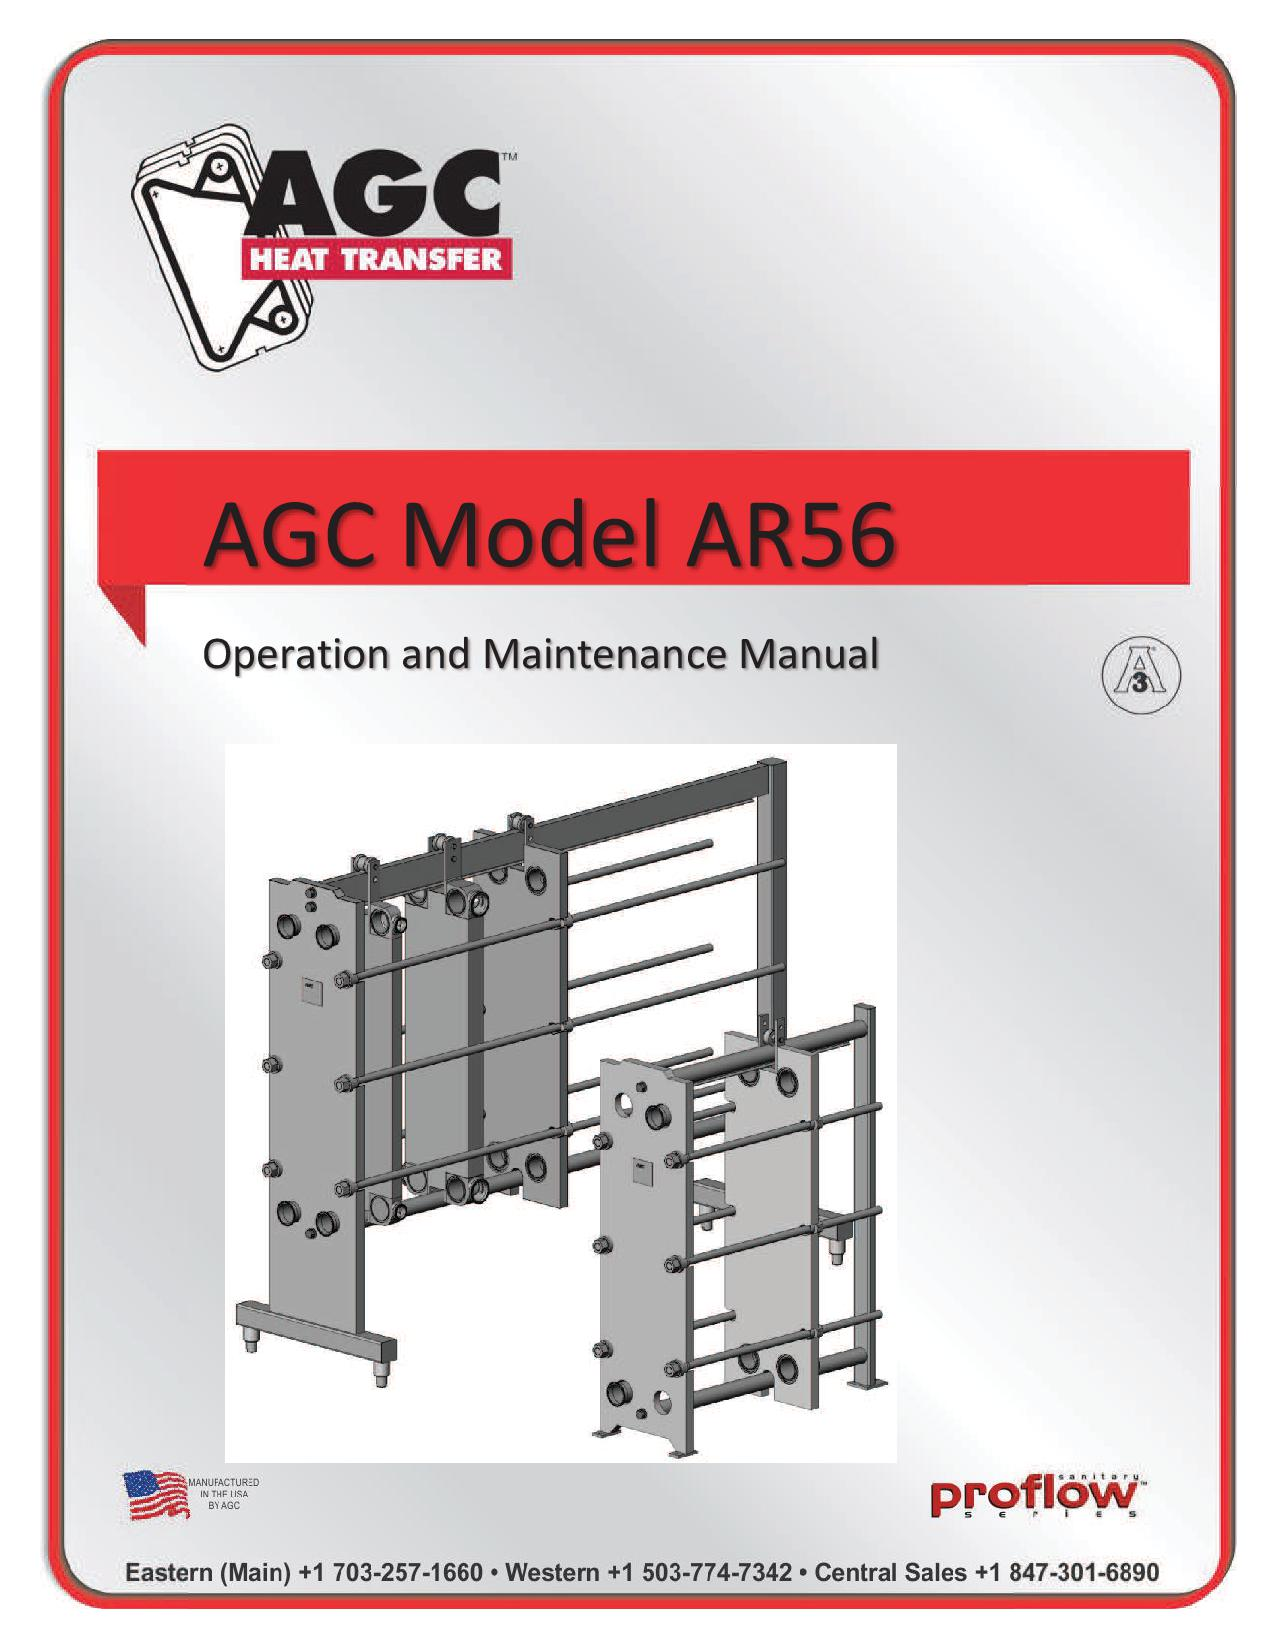 AGC Operating Manual AR56